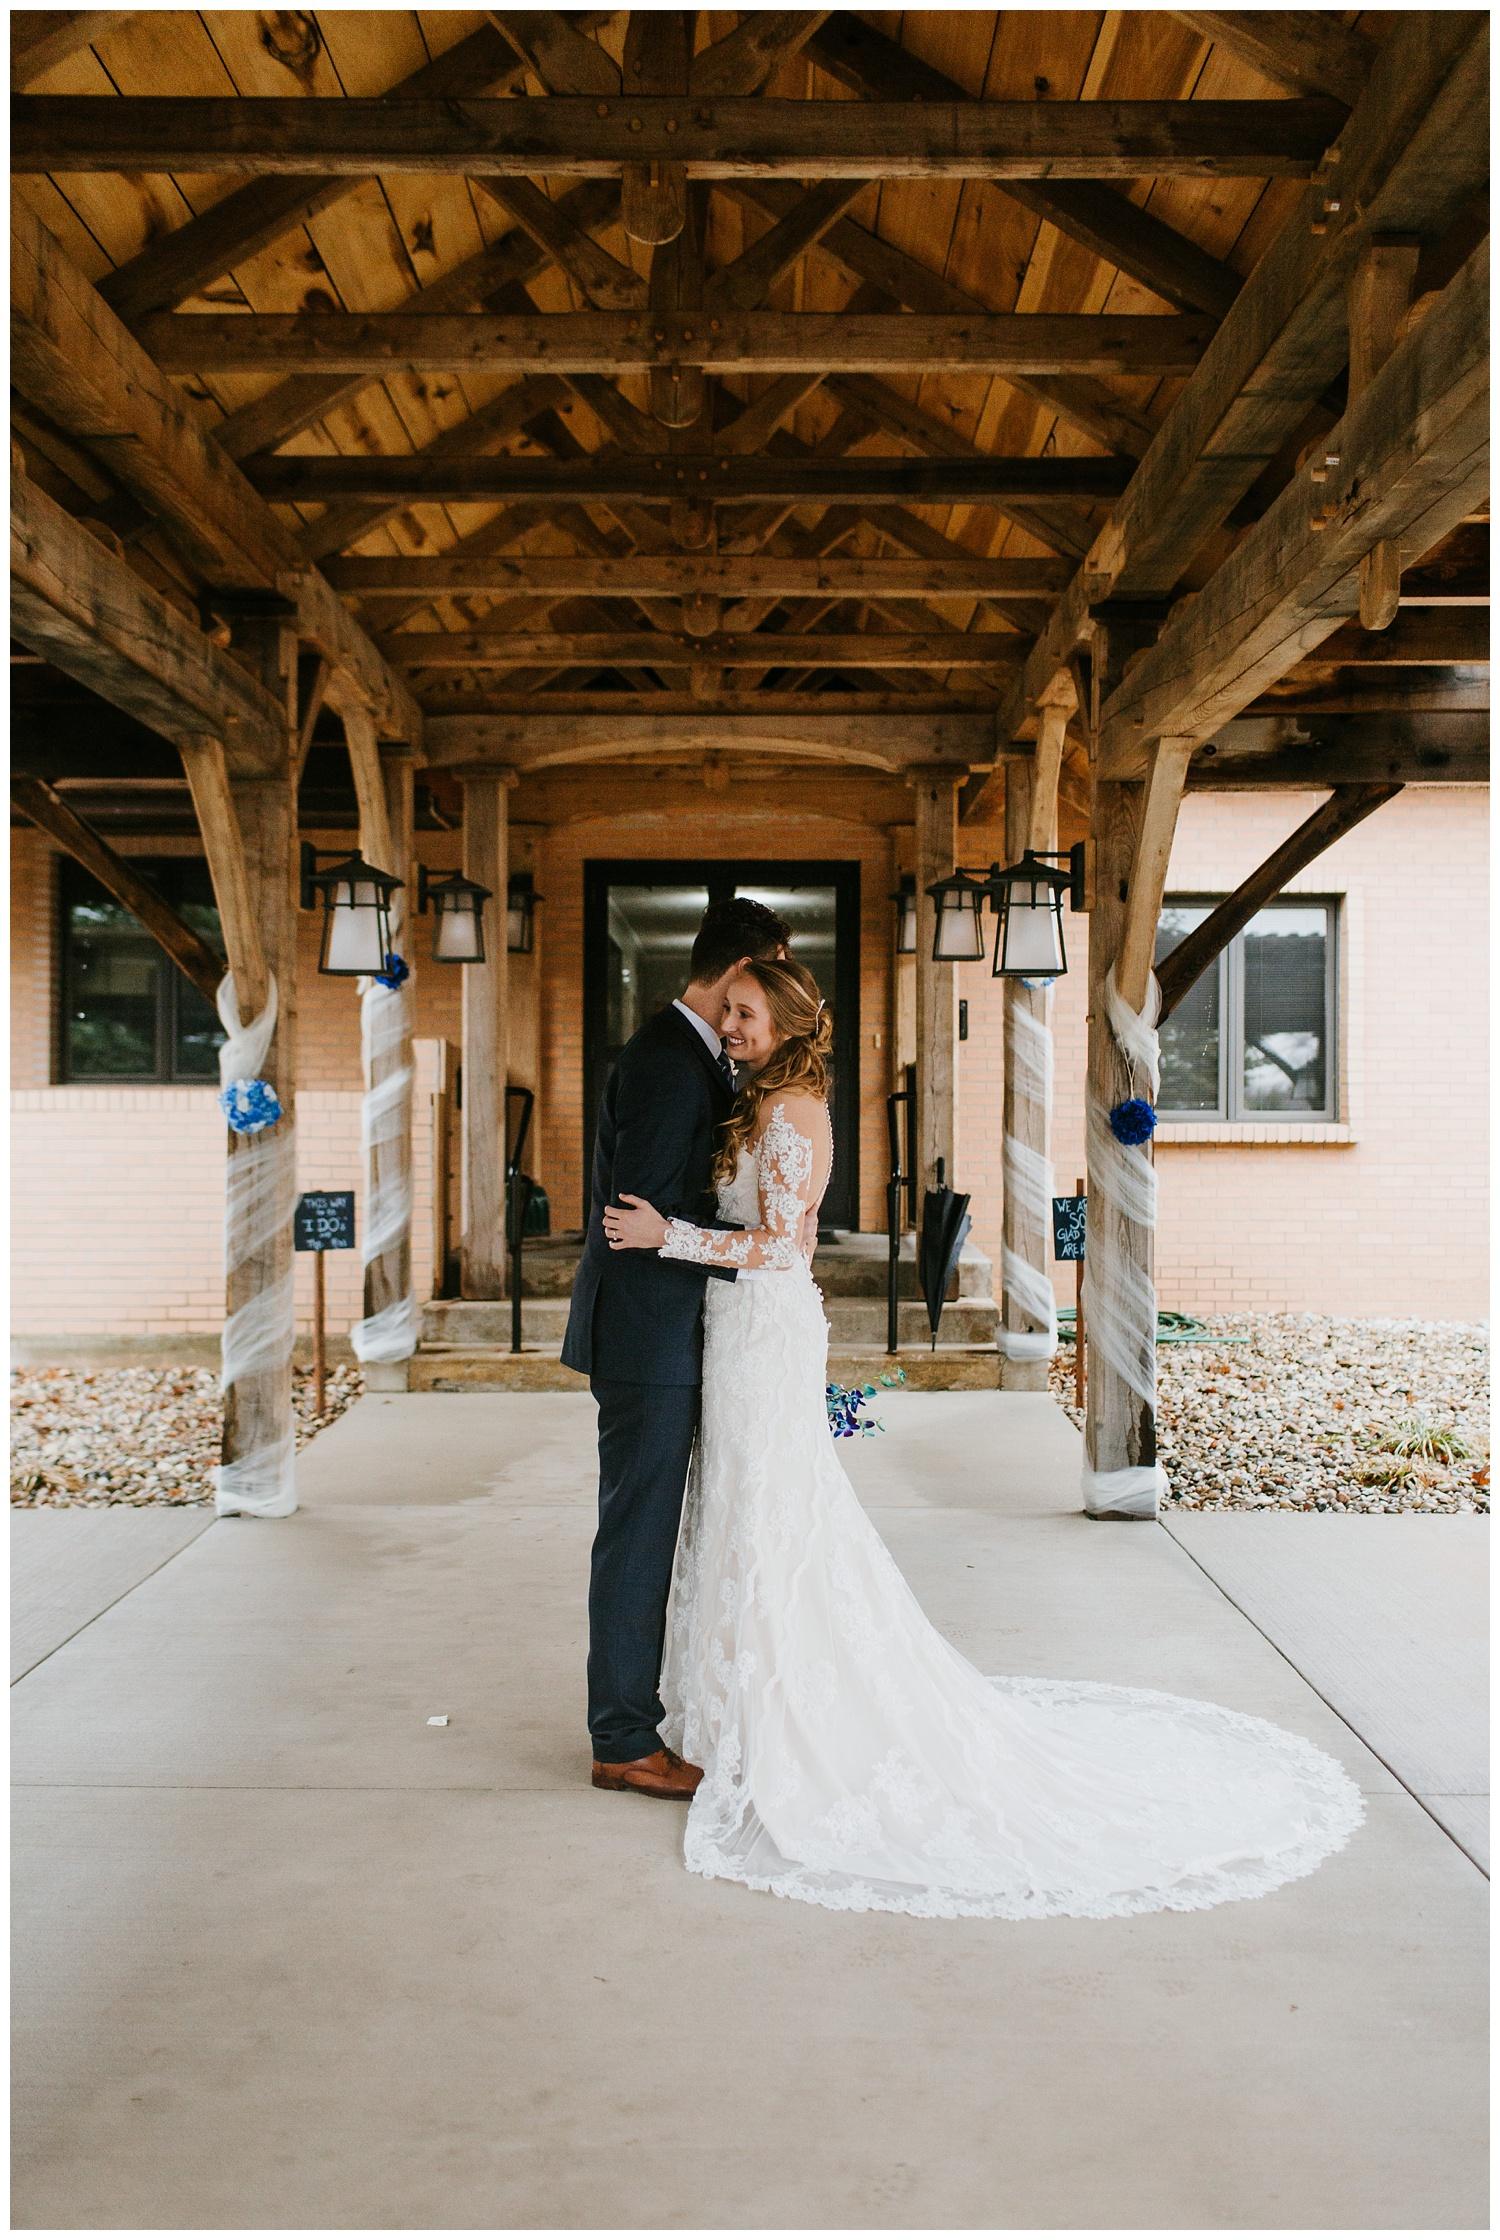 Shadowland Silver Beach St. Joseph Wedding Photographer Rainy Wedding25.jpg